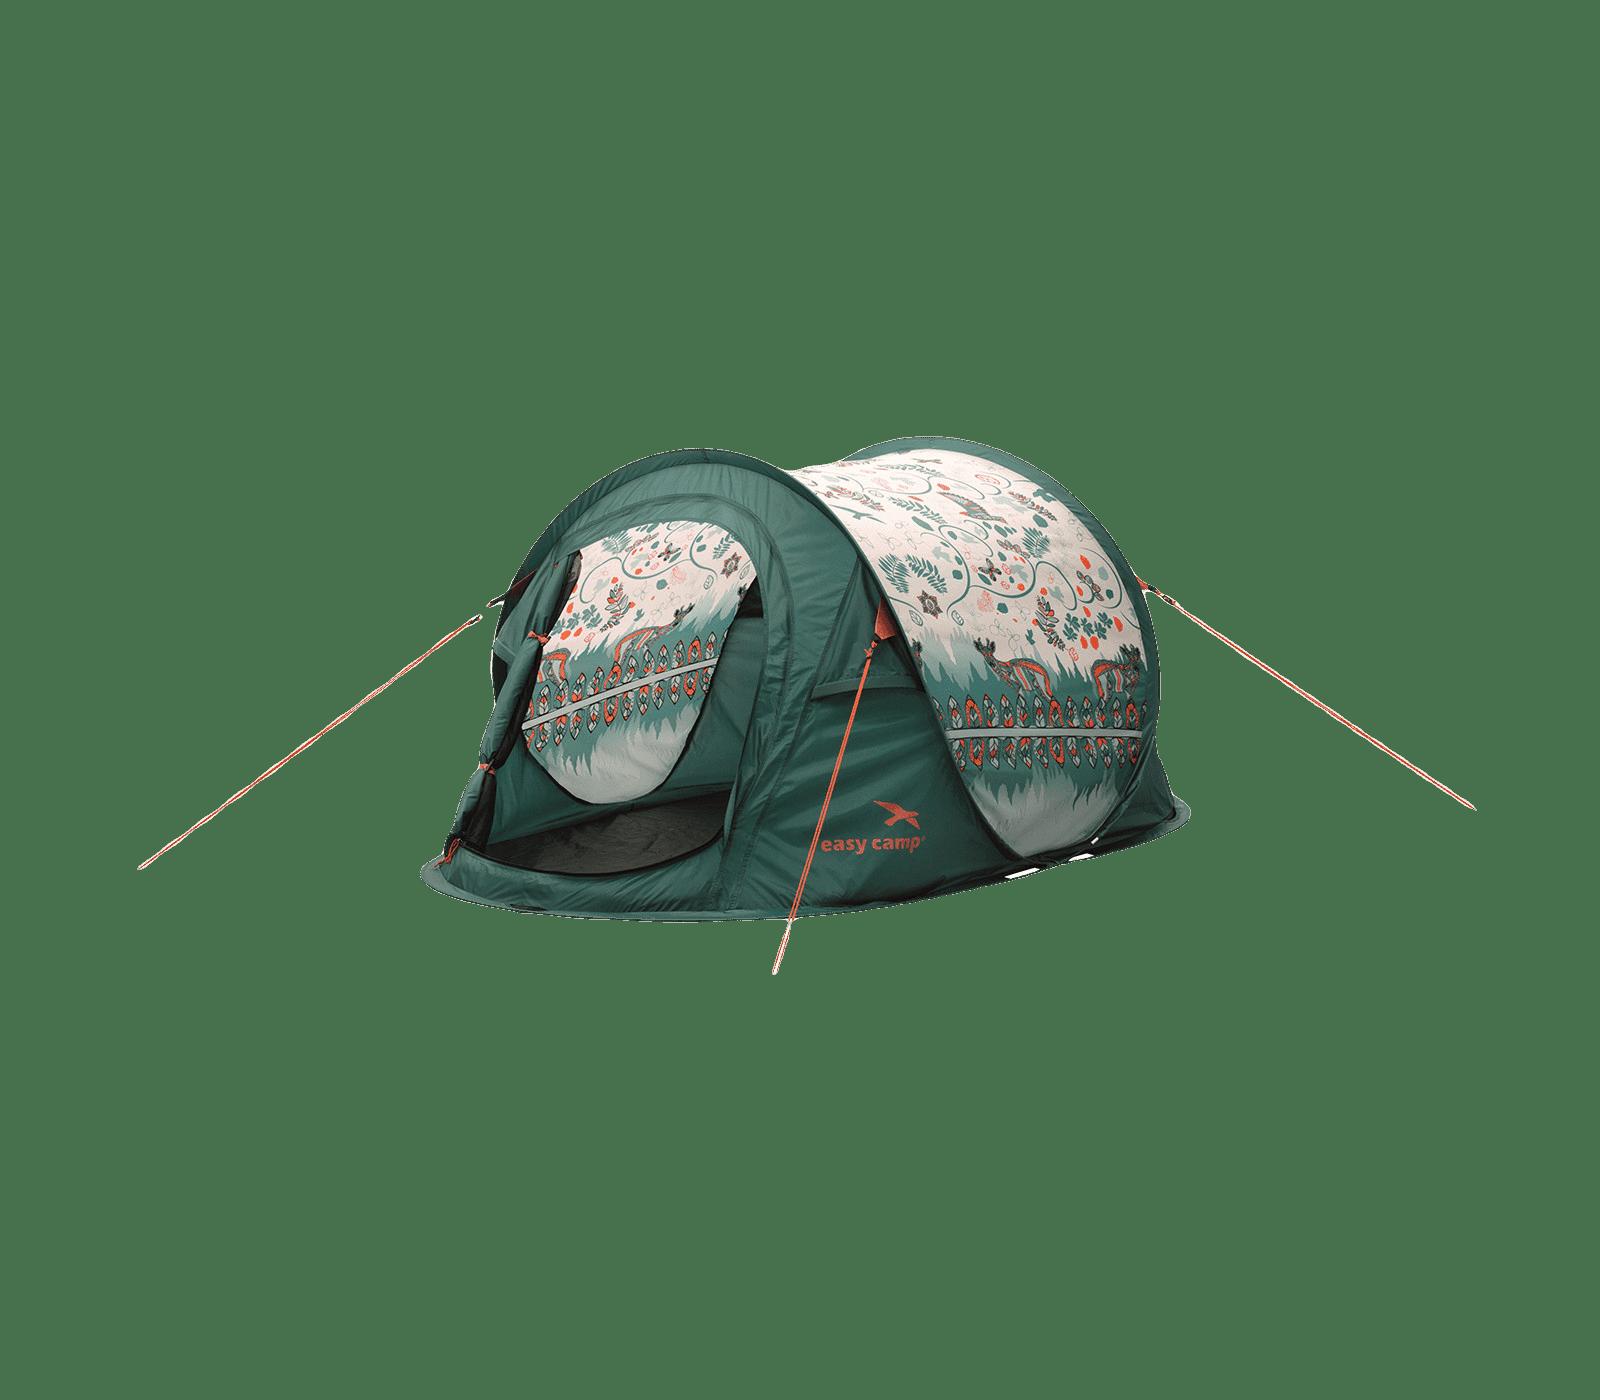 Tent daybreak